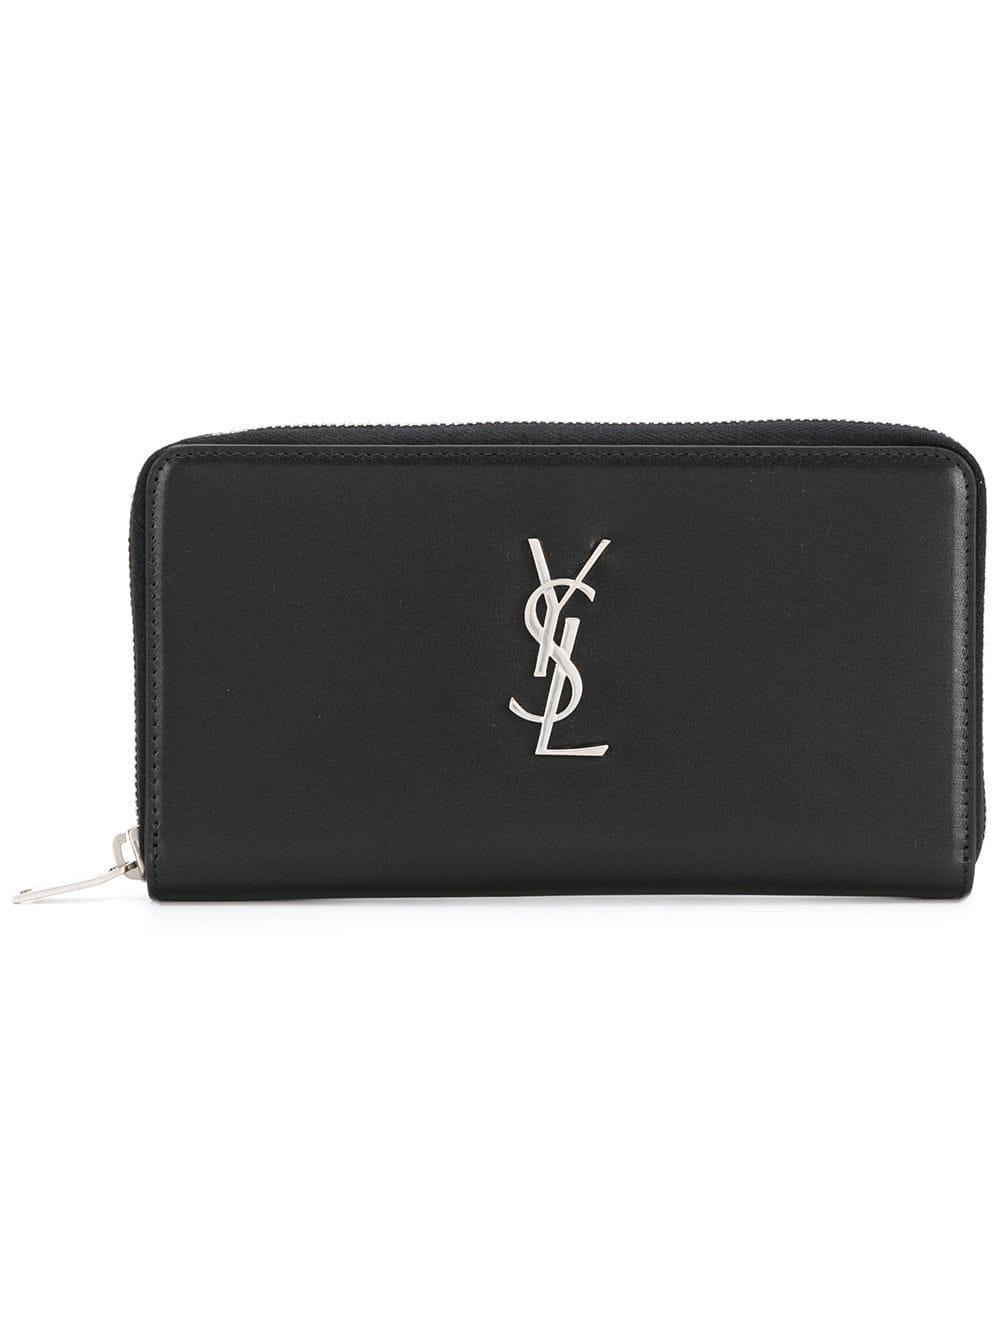 Monogram Leather Wallet